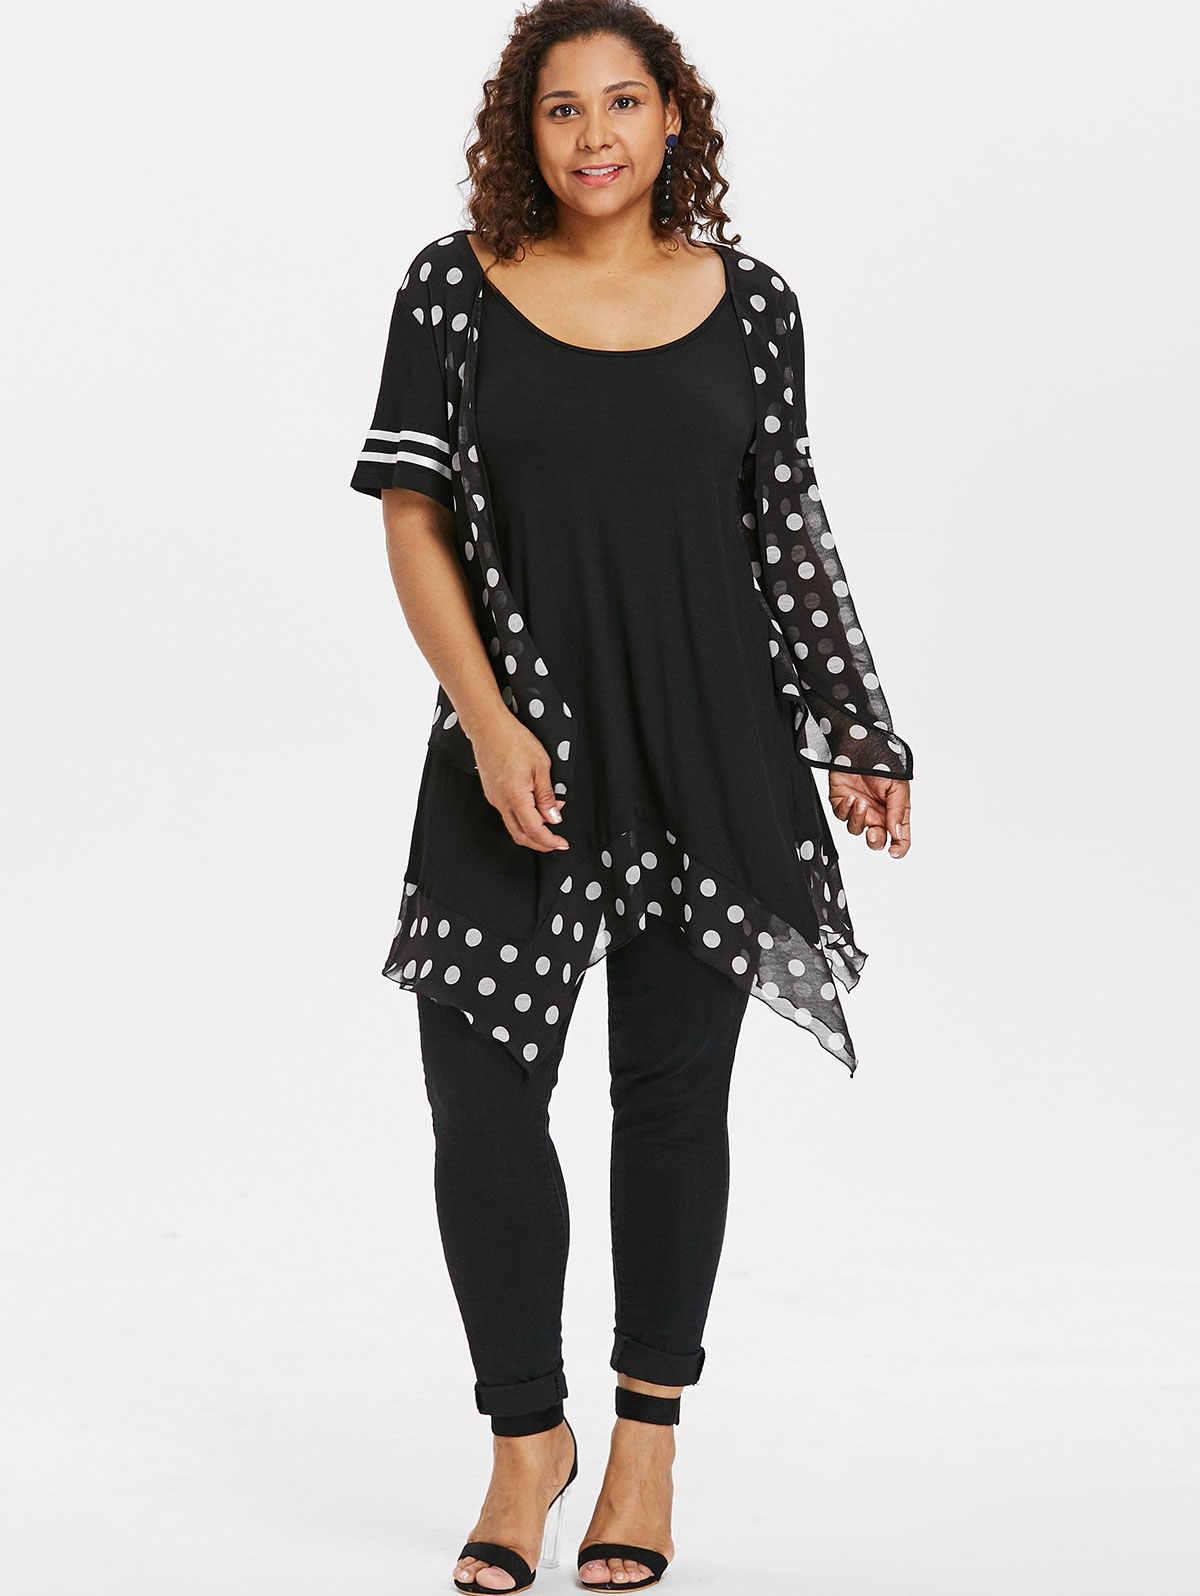 8088d8e2a5c ... Wipalo Plus Size Polka Dot Flyaway T-Shirt Scoop Neck Handkerchief Hem Tunic  Tee 2018 ...